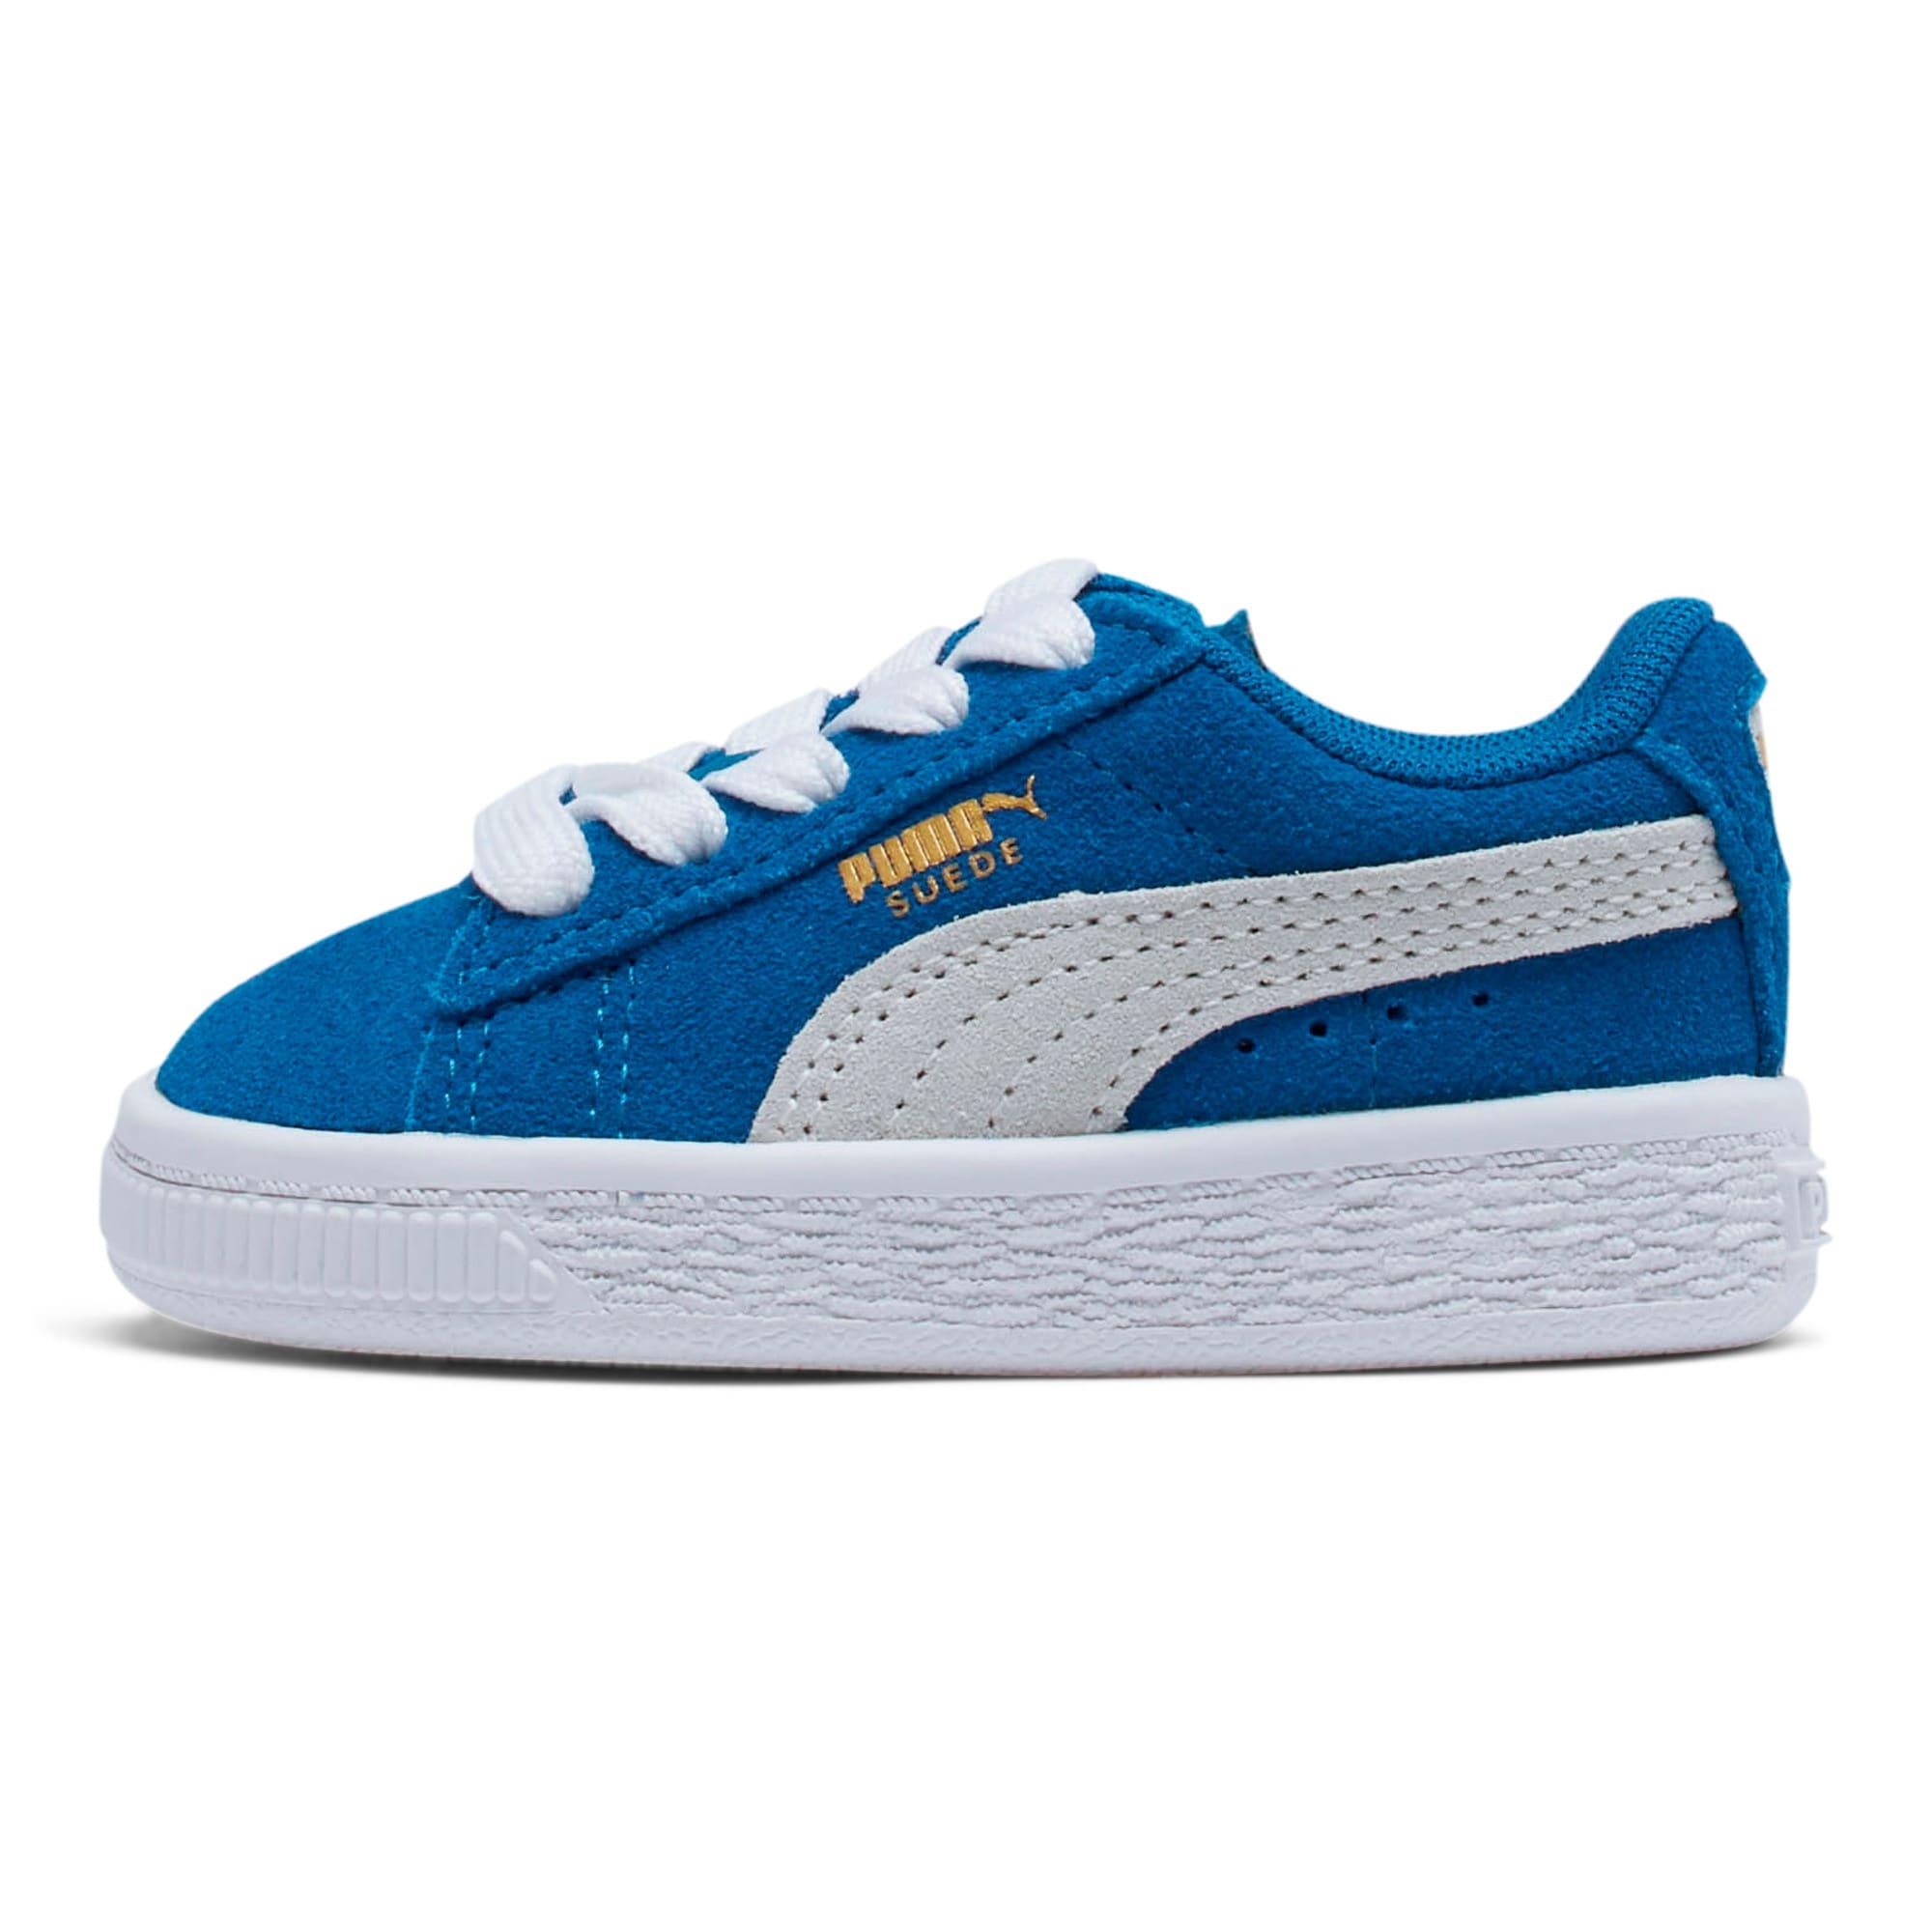 Thumbnail 1 of Puma Suede Toddler Shoes, Snorkel Blue-Puma White, medium